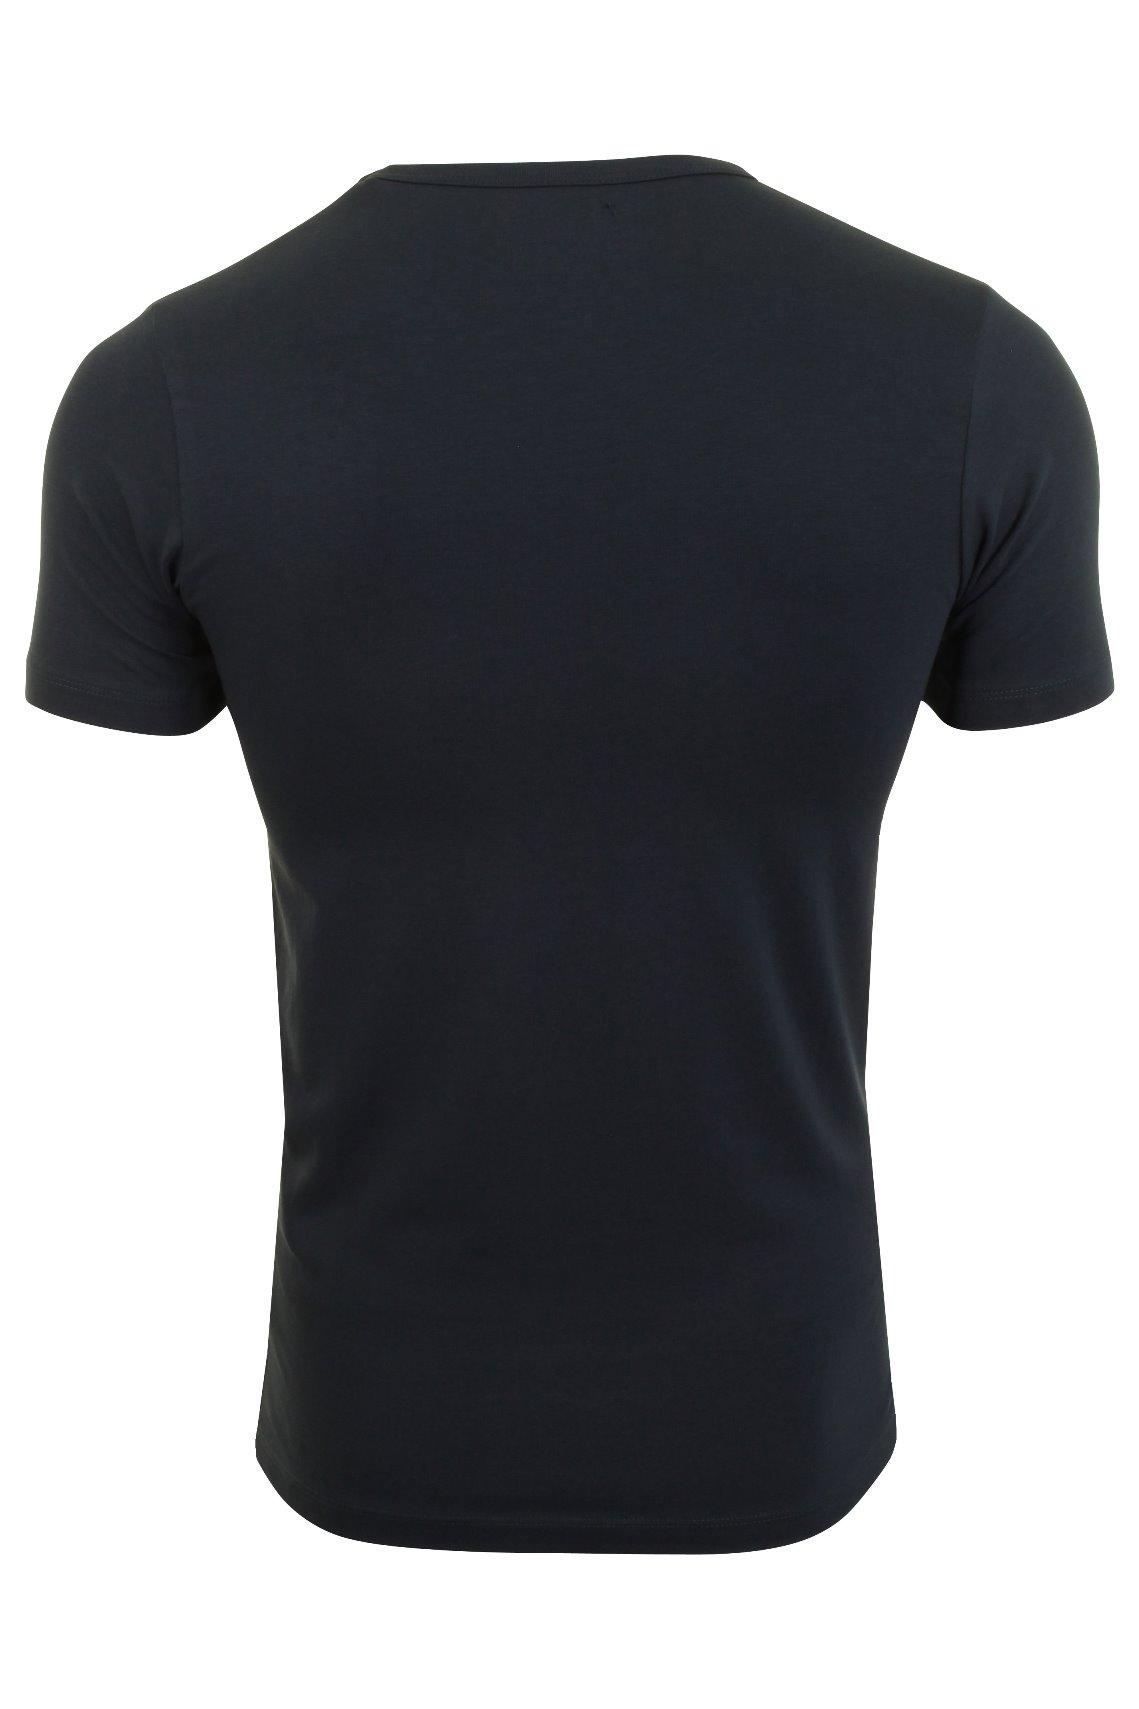 Jack-amp-Jones-De-Hombre-S-S-Cuello-Redondo-Camiseta-Slim-Fit miniatura 8